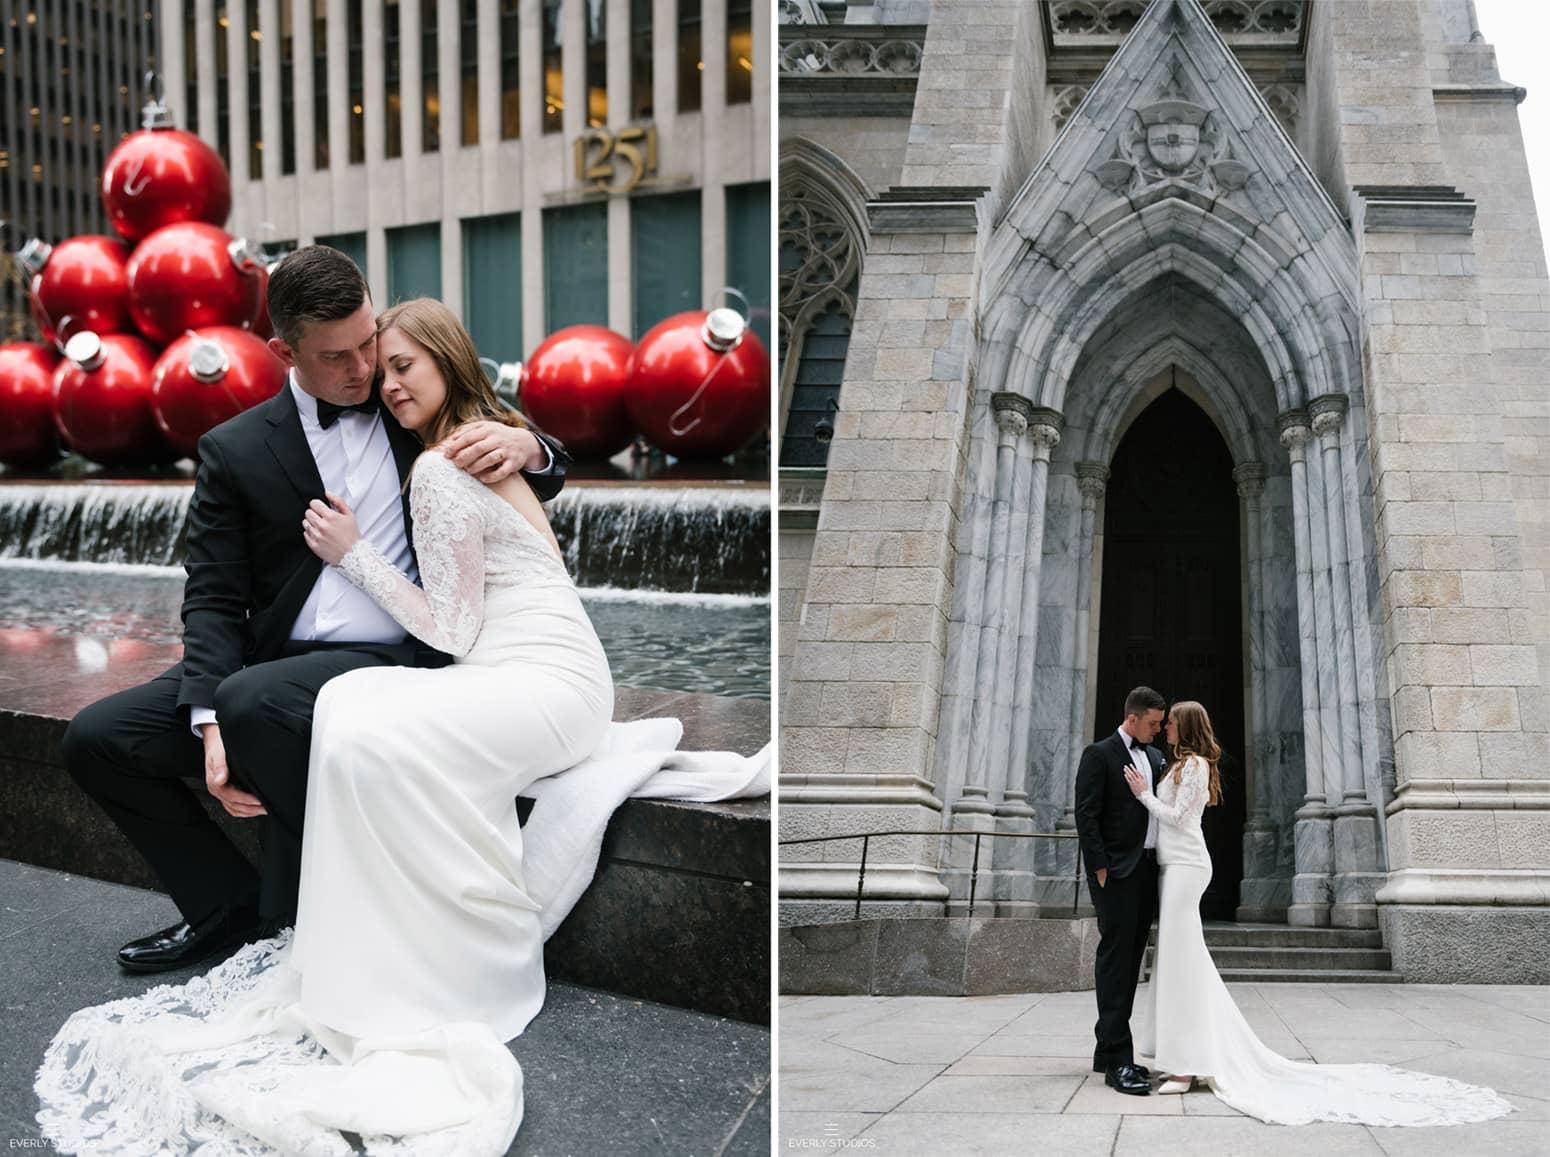 Gapstow Bridge wedding in Central Park NYC. Winter Central Park elopement at Gapstow Bridge in New York. Photo by NYC elopement photographer Everly Studios, www.everlystudios.com